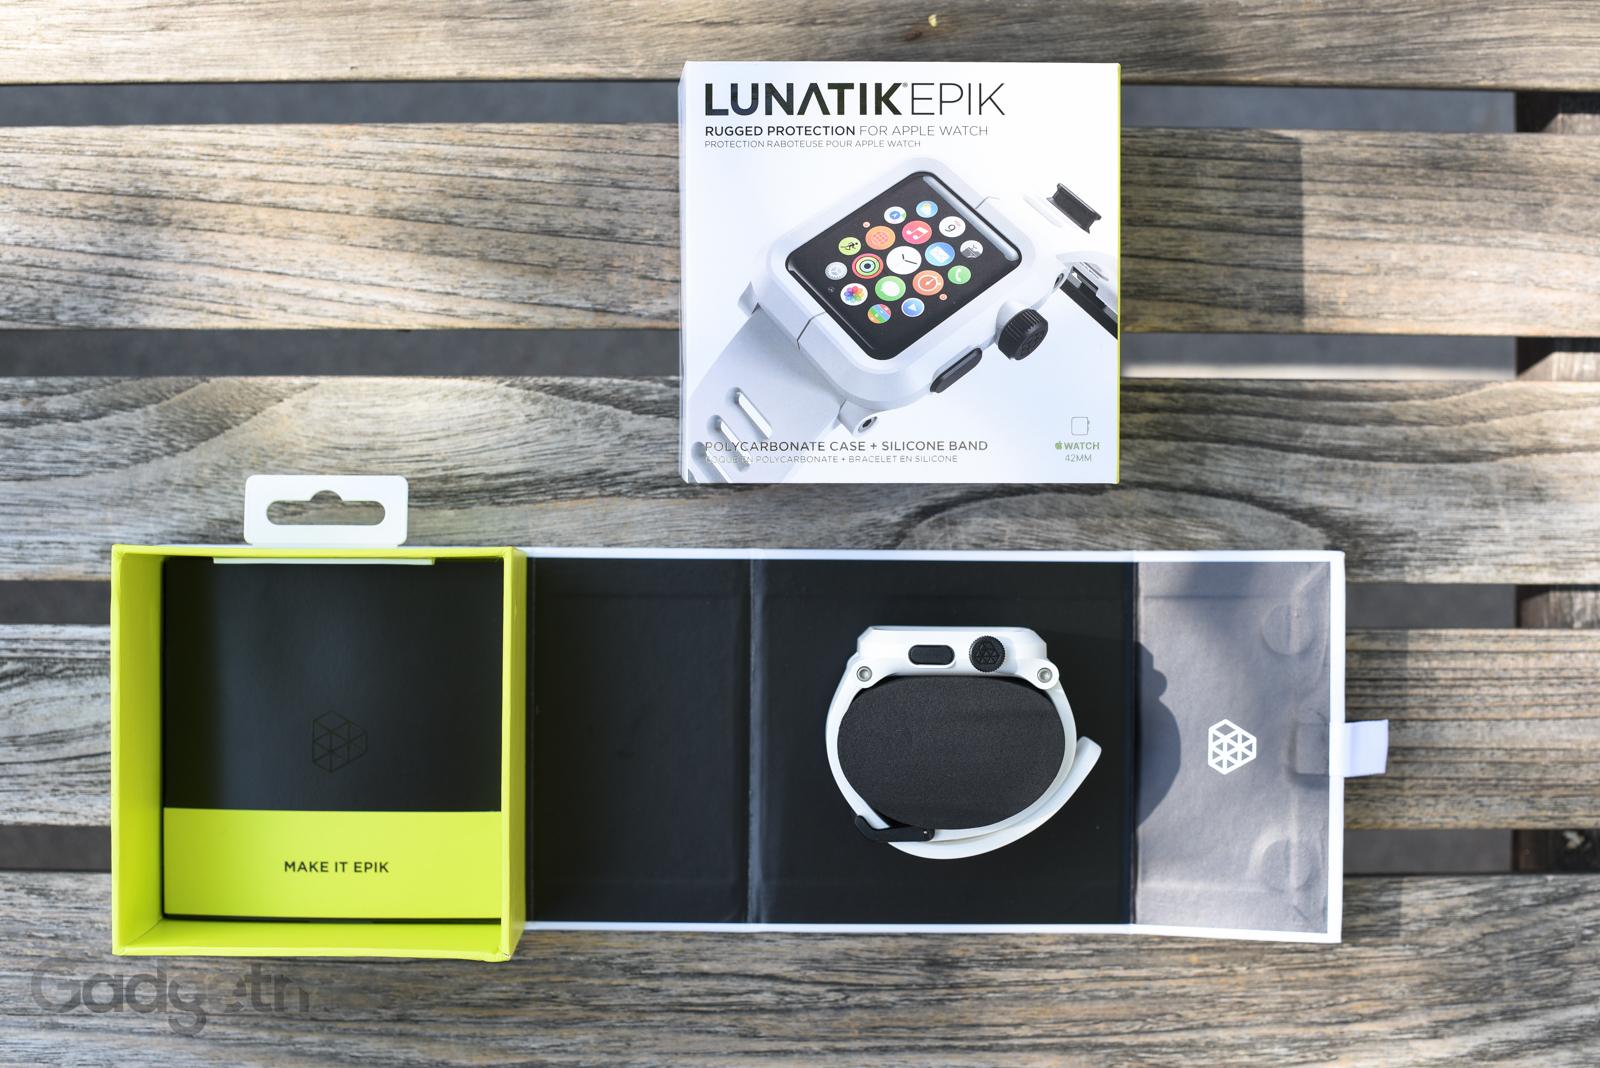 lunatik_epik_apple_watch_case_packaging.jpg